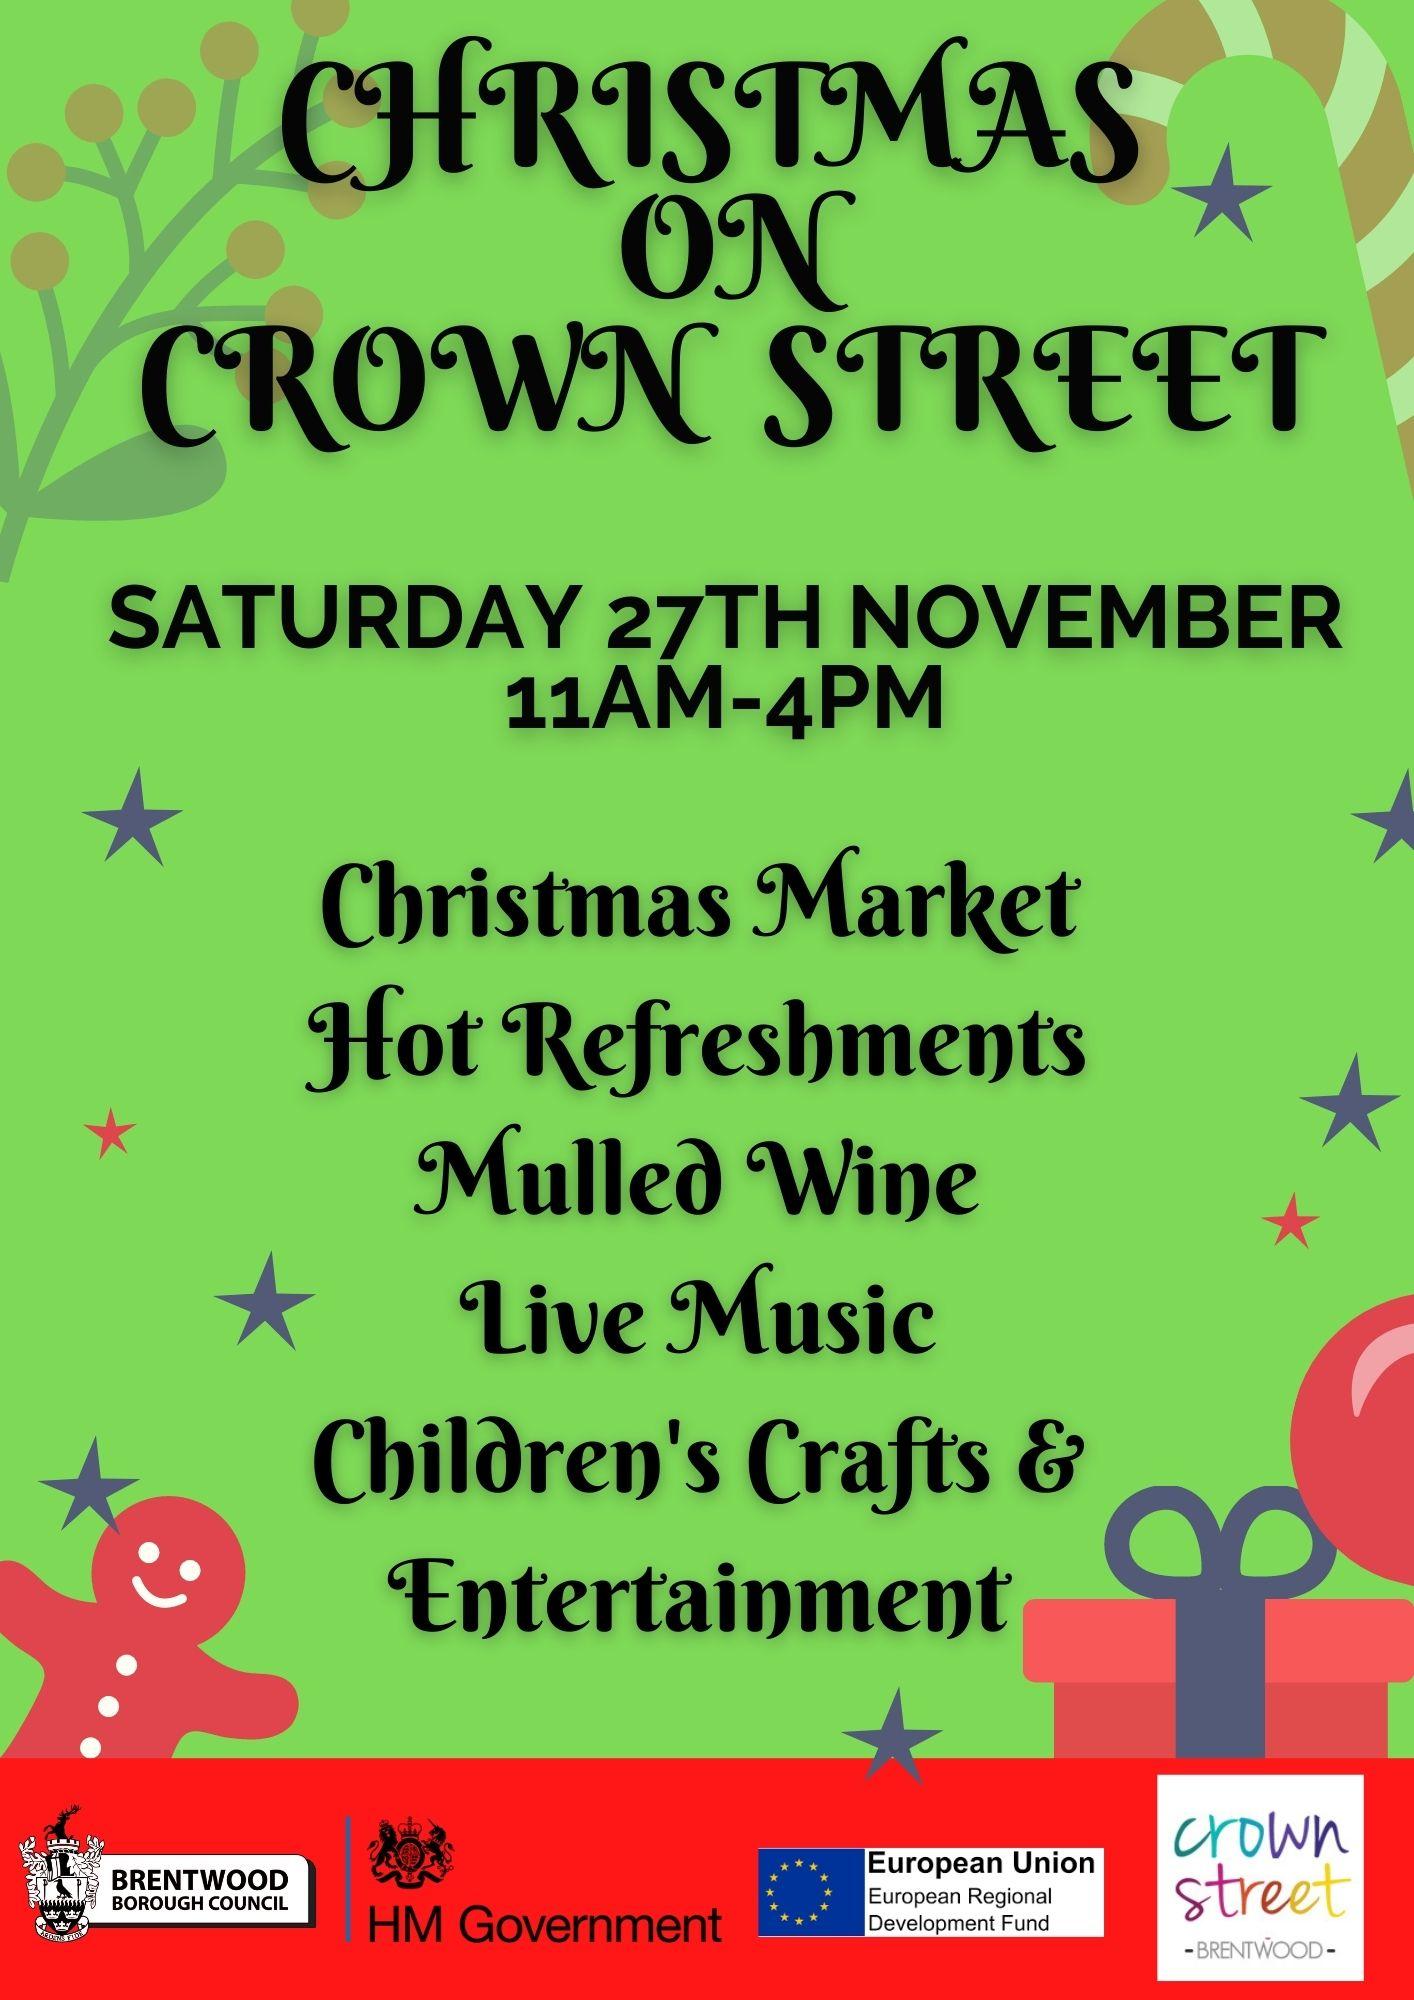 CHRISTMAS ON CROWN STREET